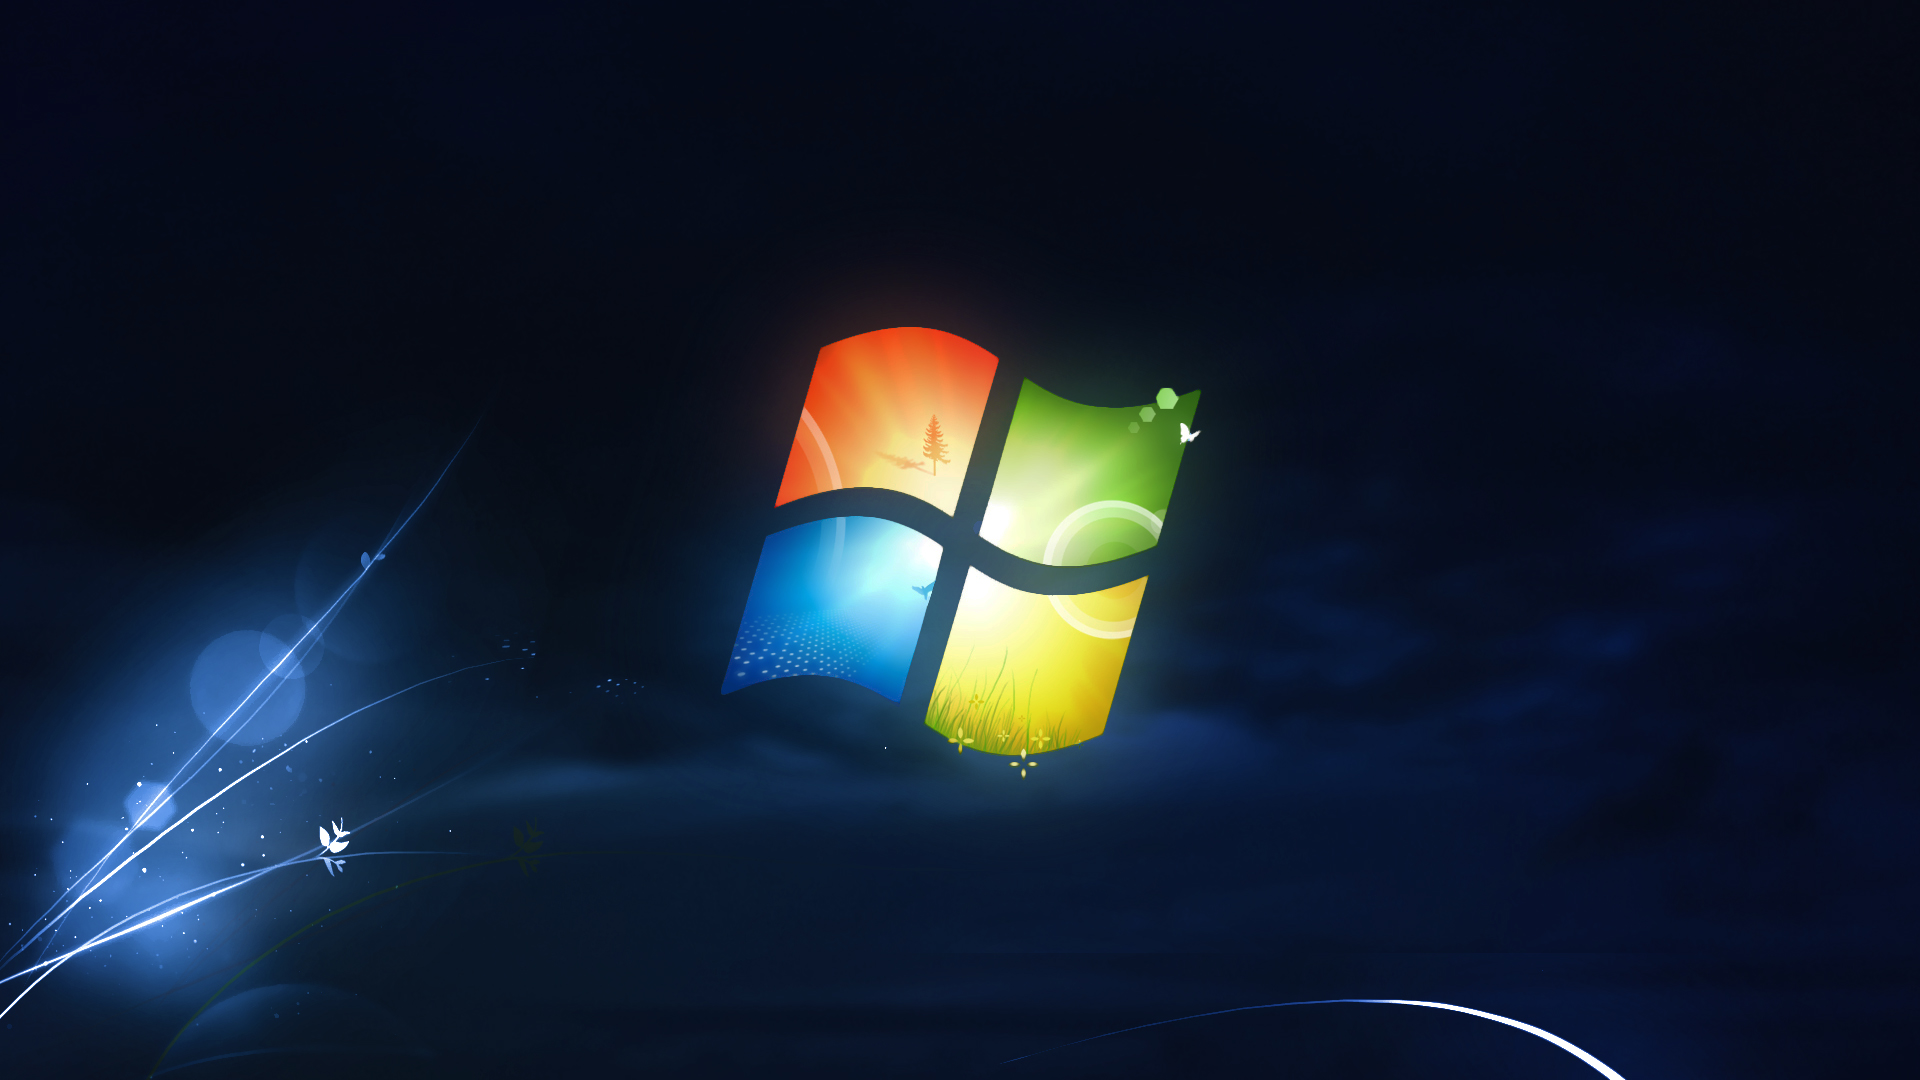 microsoft windows wallpaper 1920x1080 microsoft windows logos